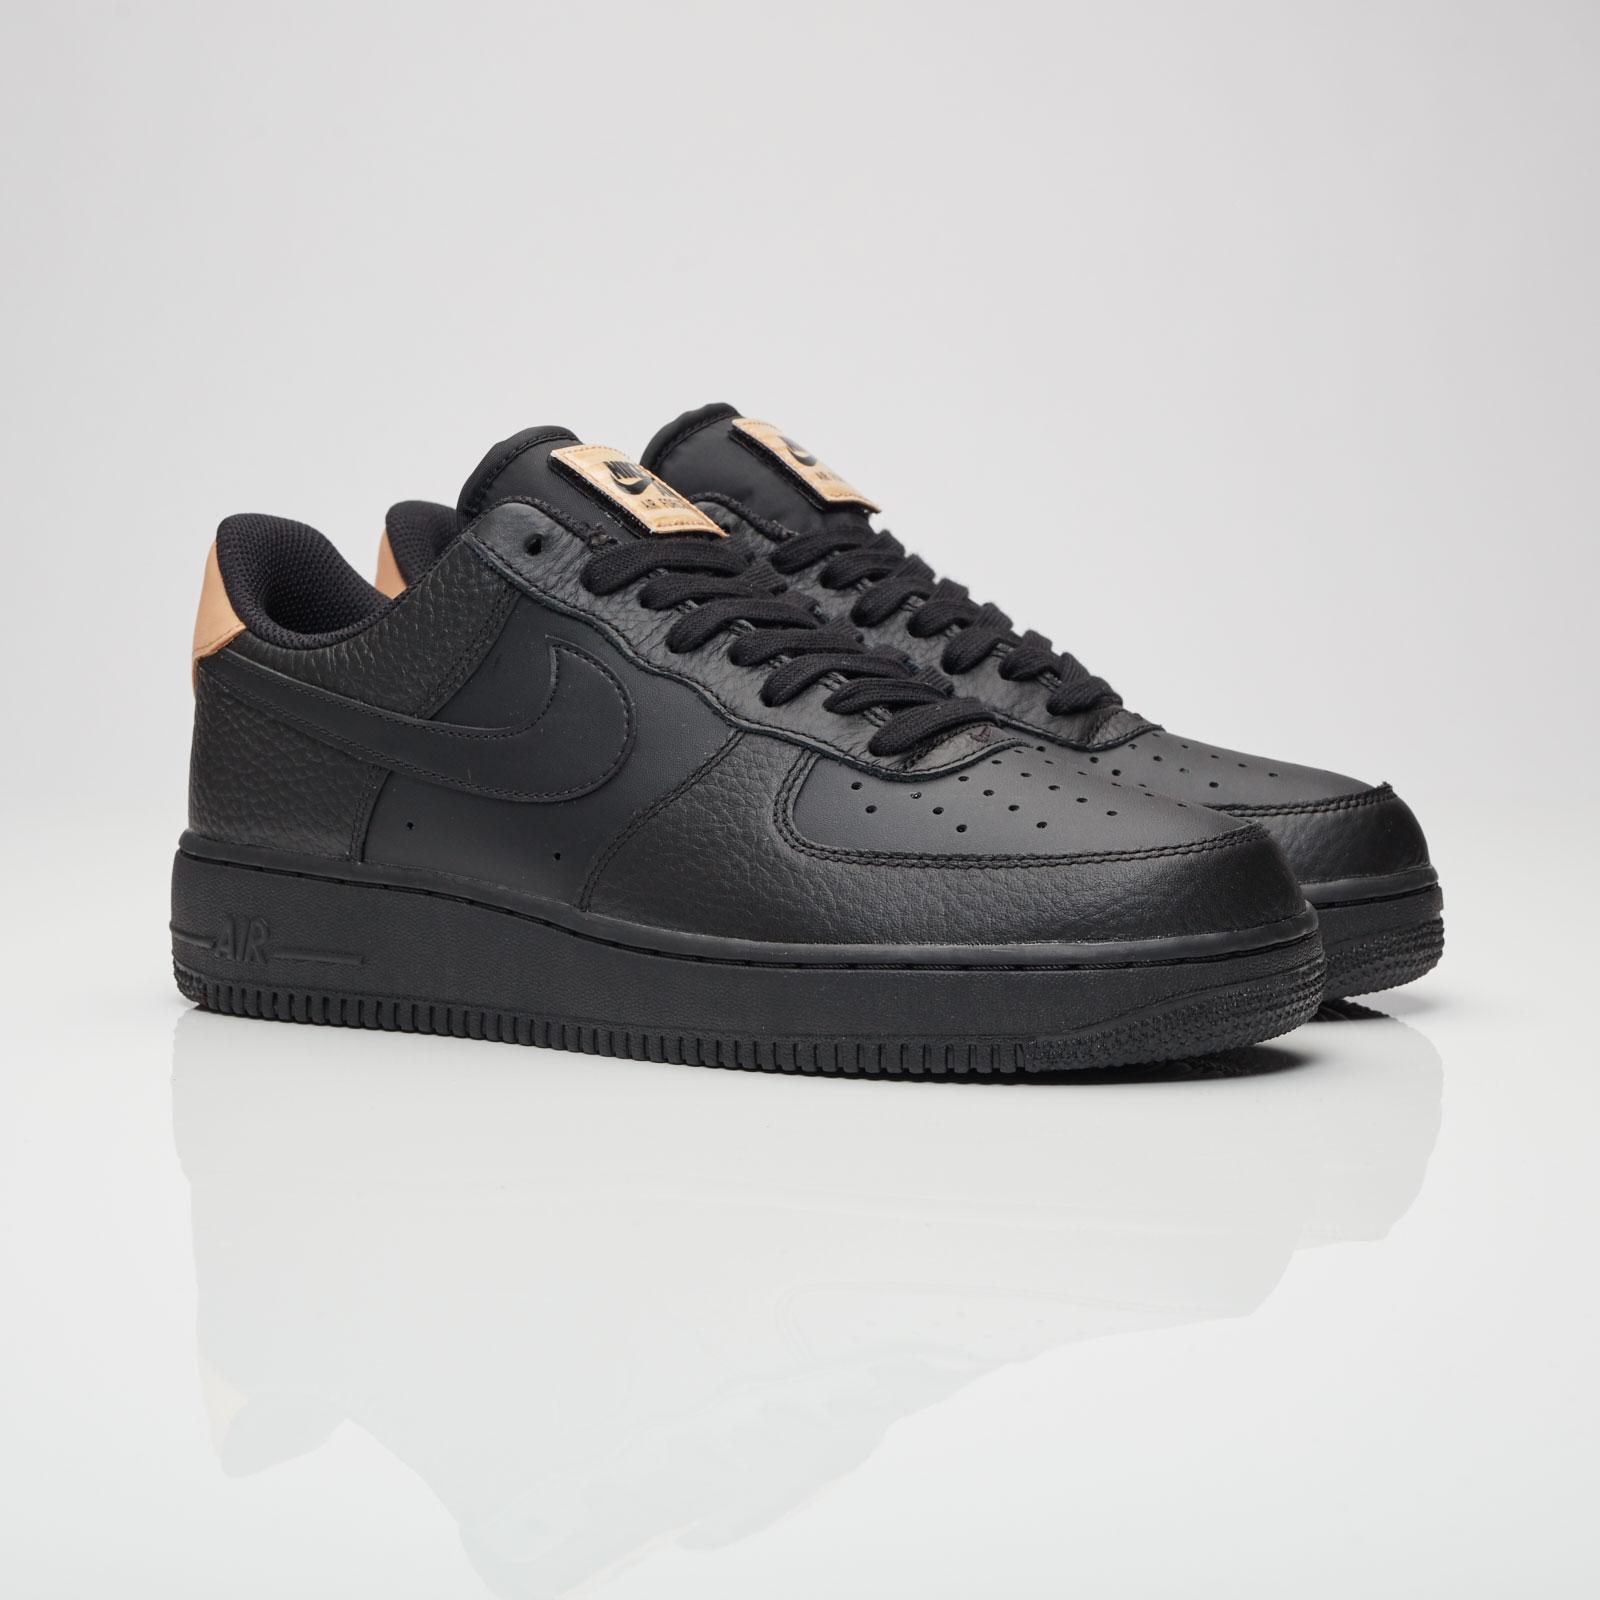 huge discount 37d21 9748e Nike Sportswear Air Force 1 07 Lv8